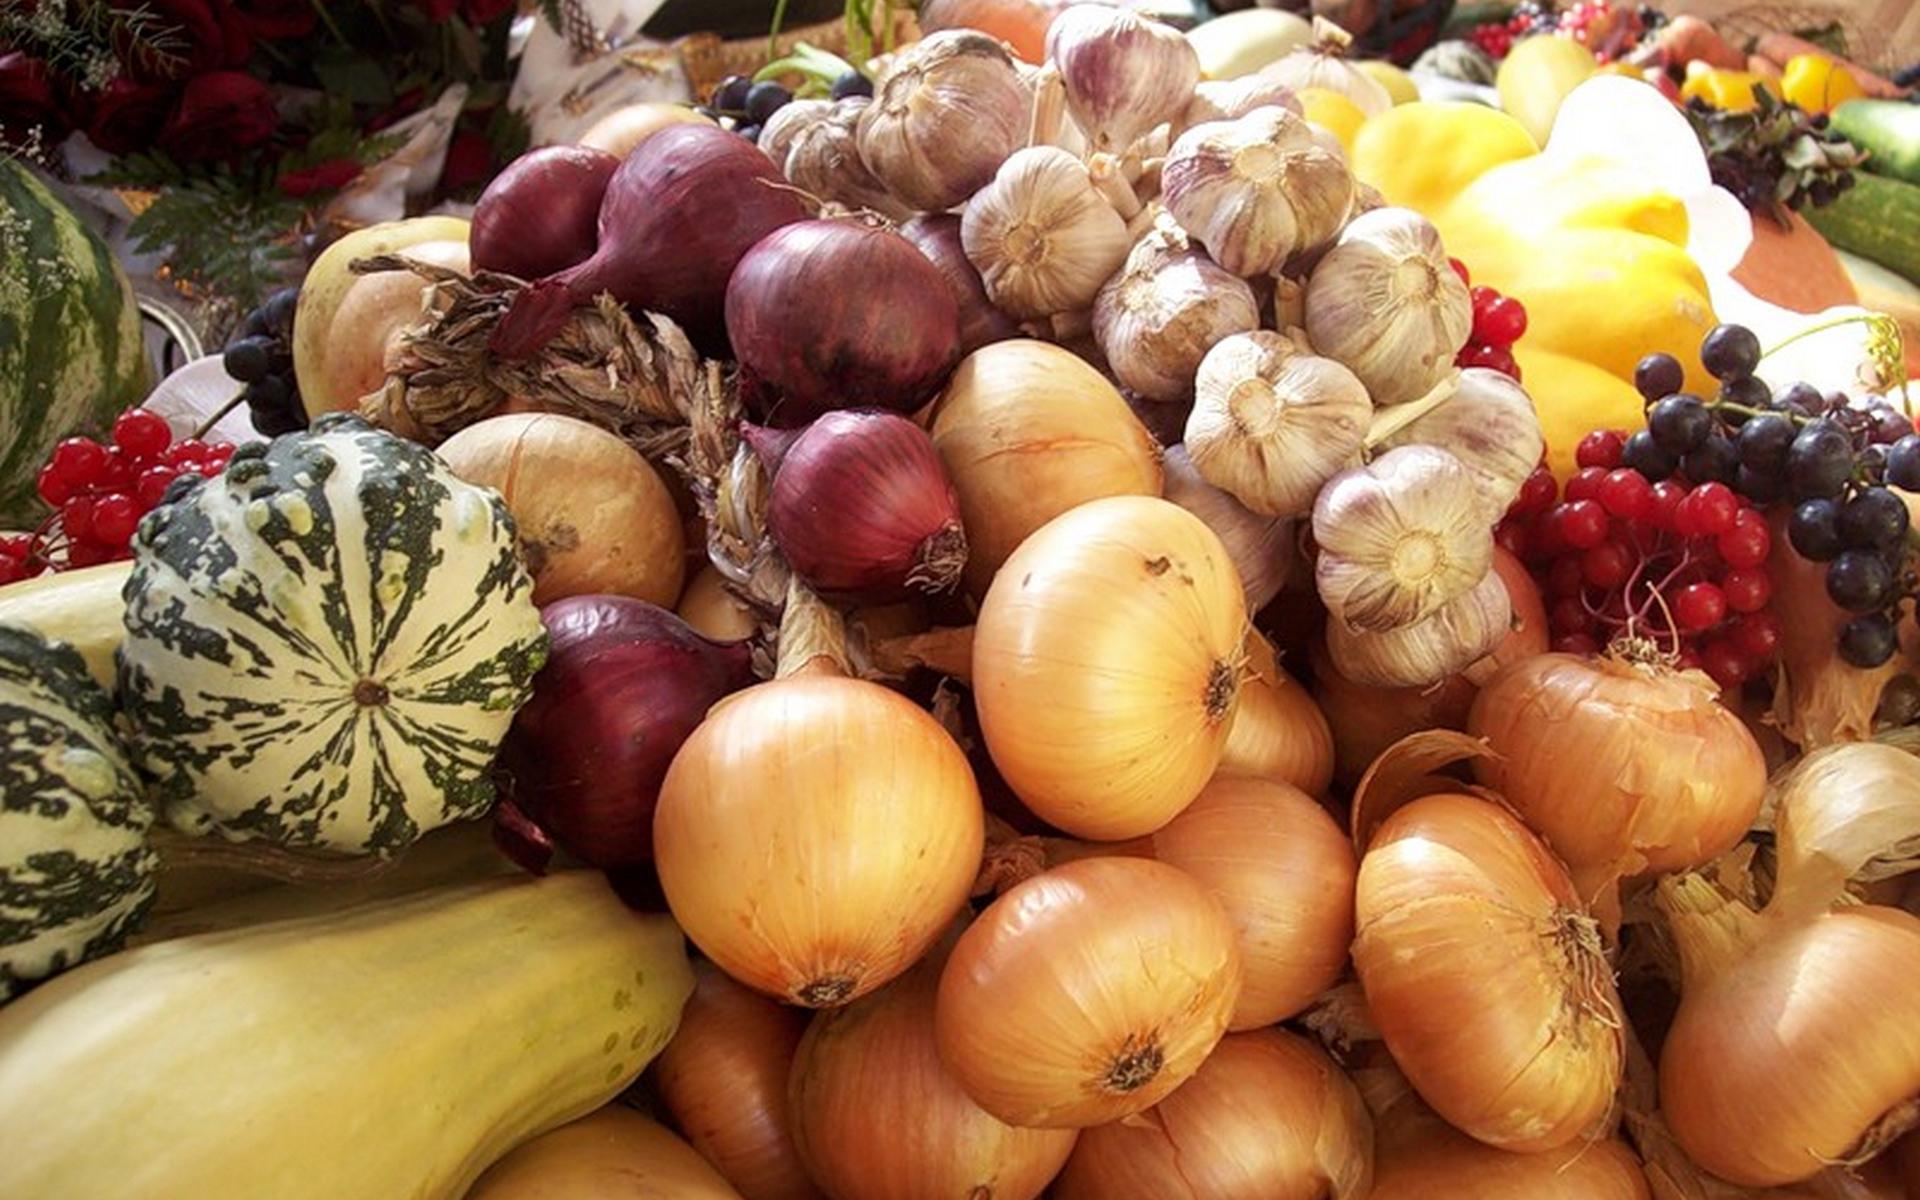 овощи, фрукты, лук